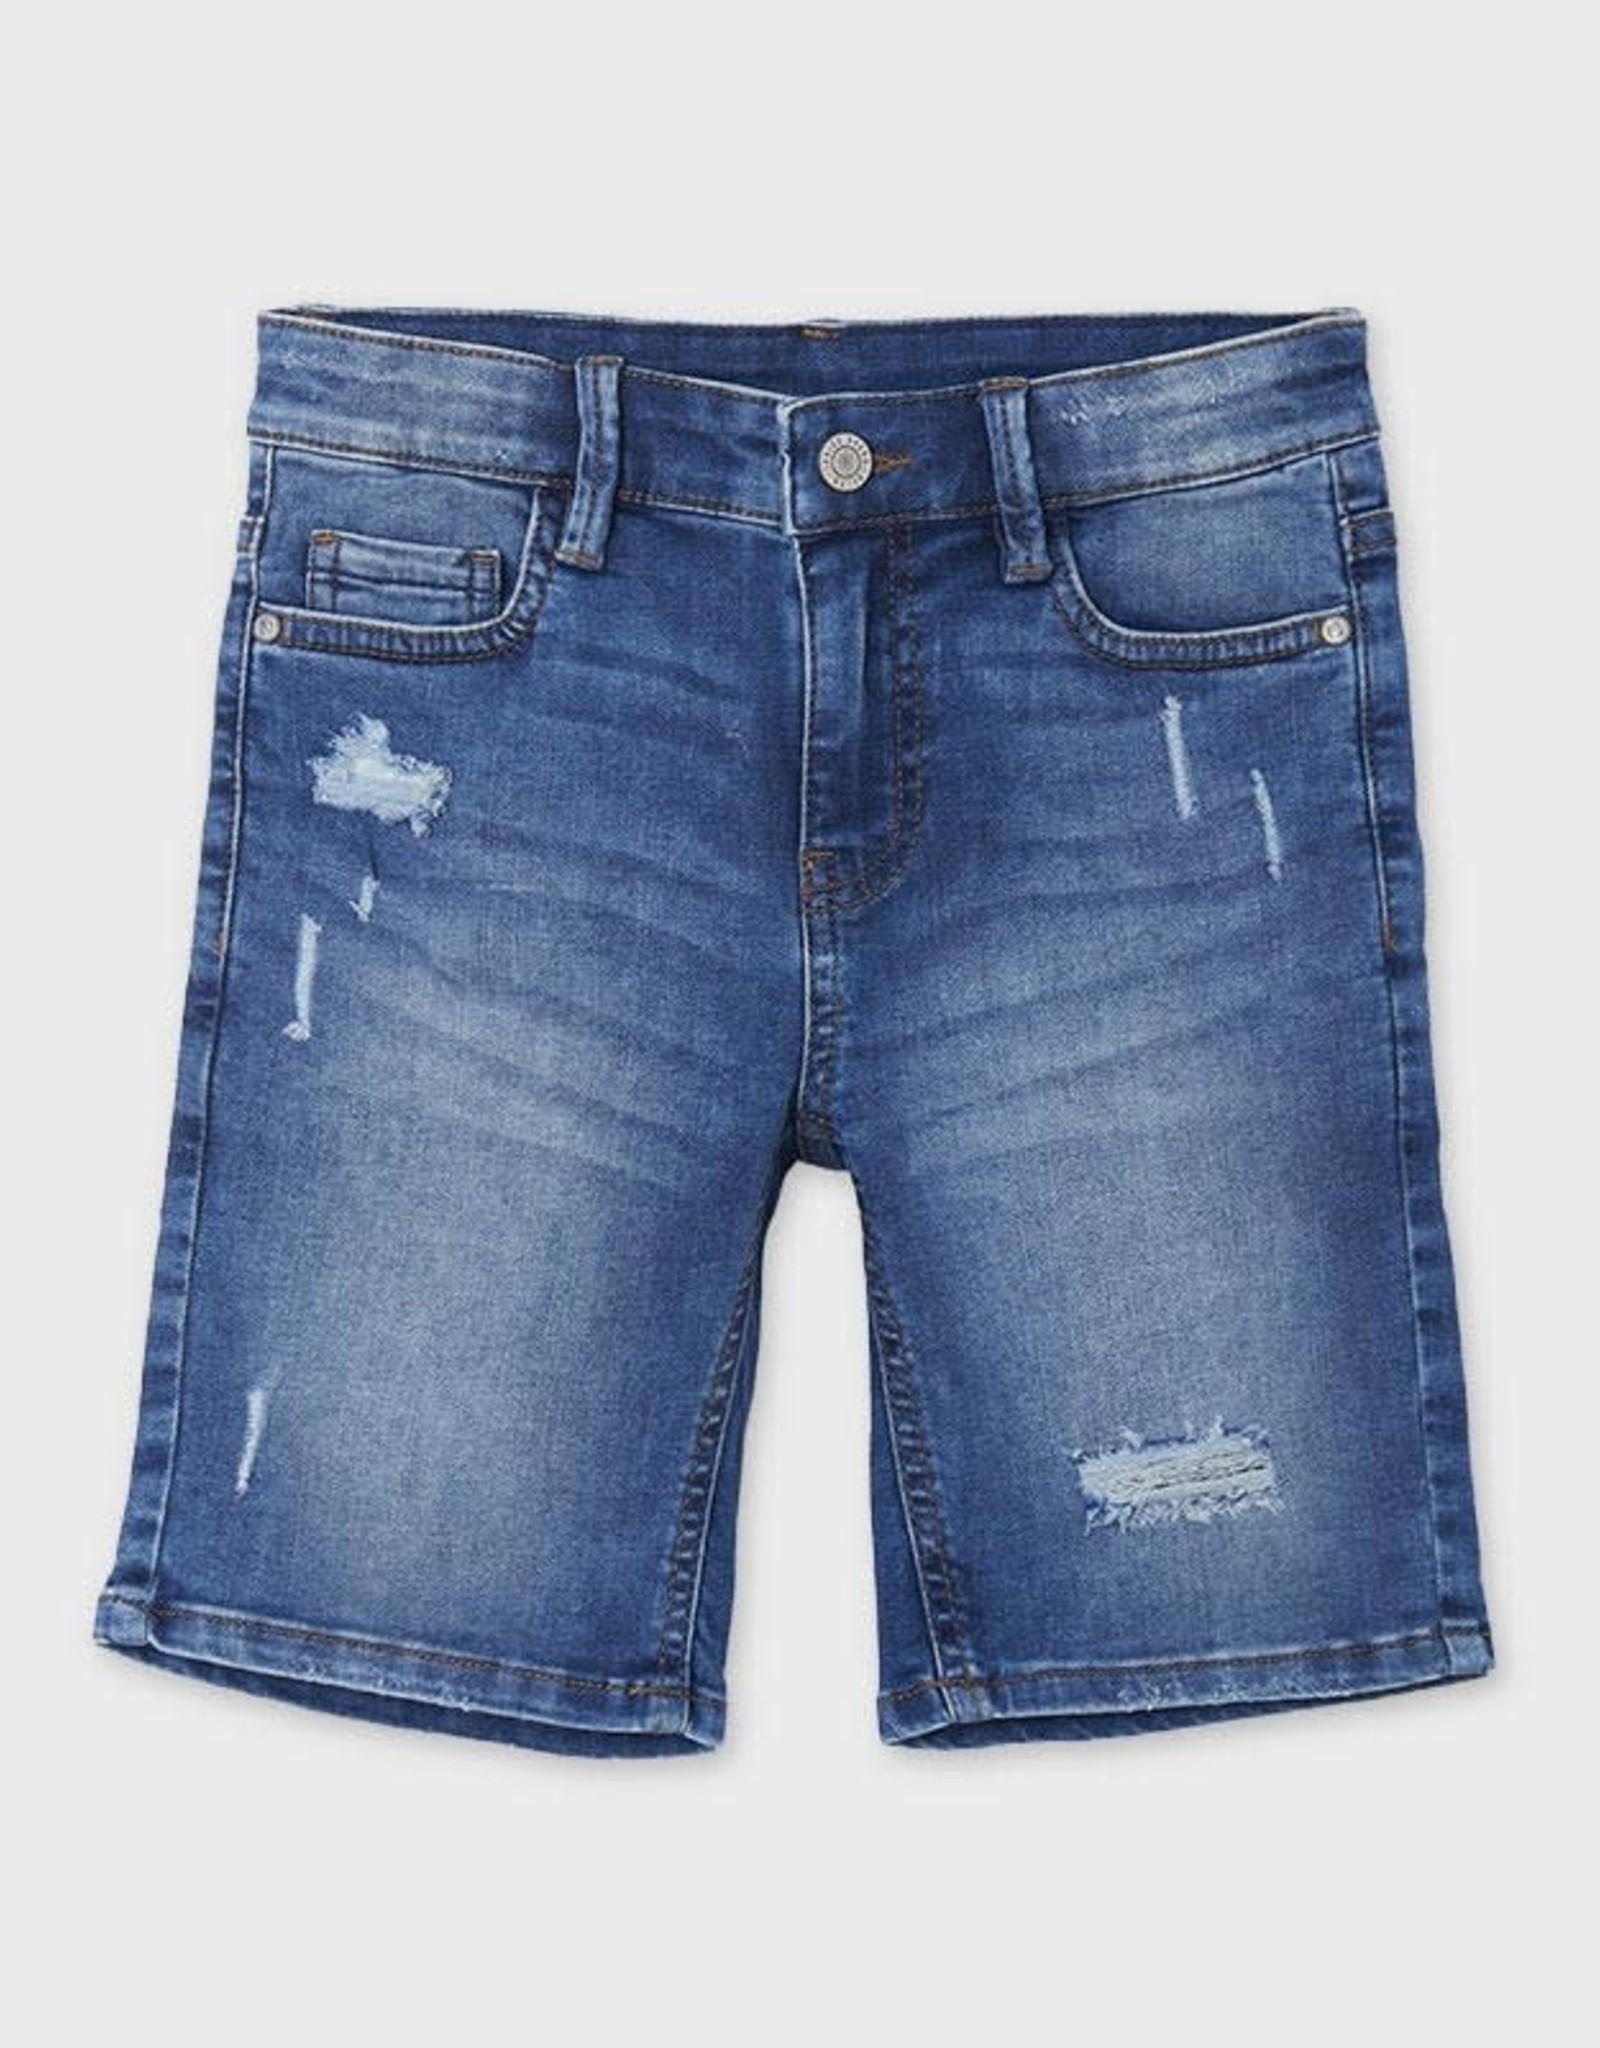 Mayoral Mayoral Ecofriends Denim Bermuda Shorts